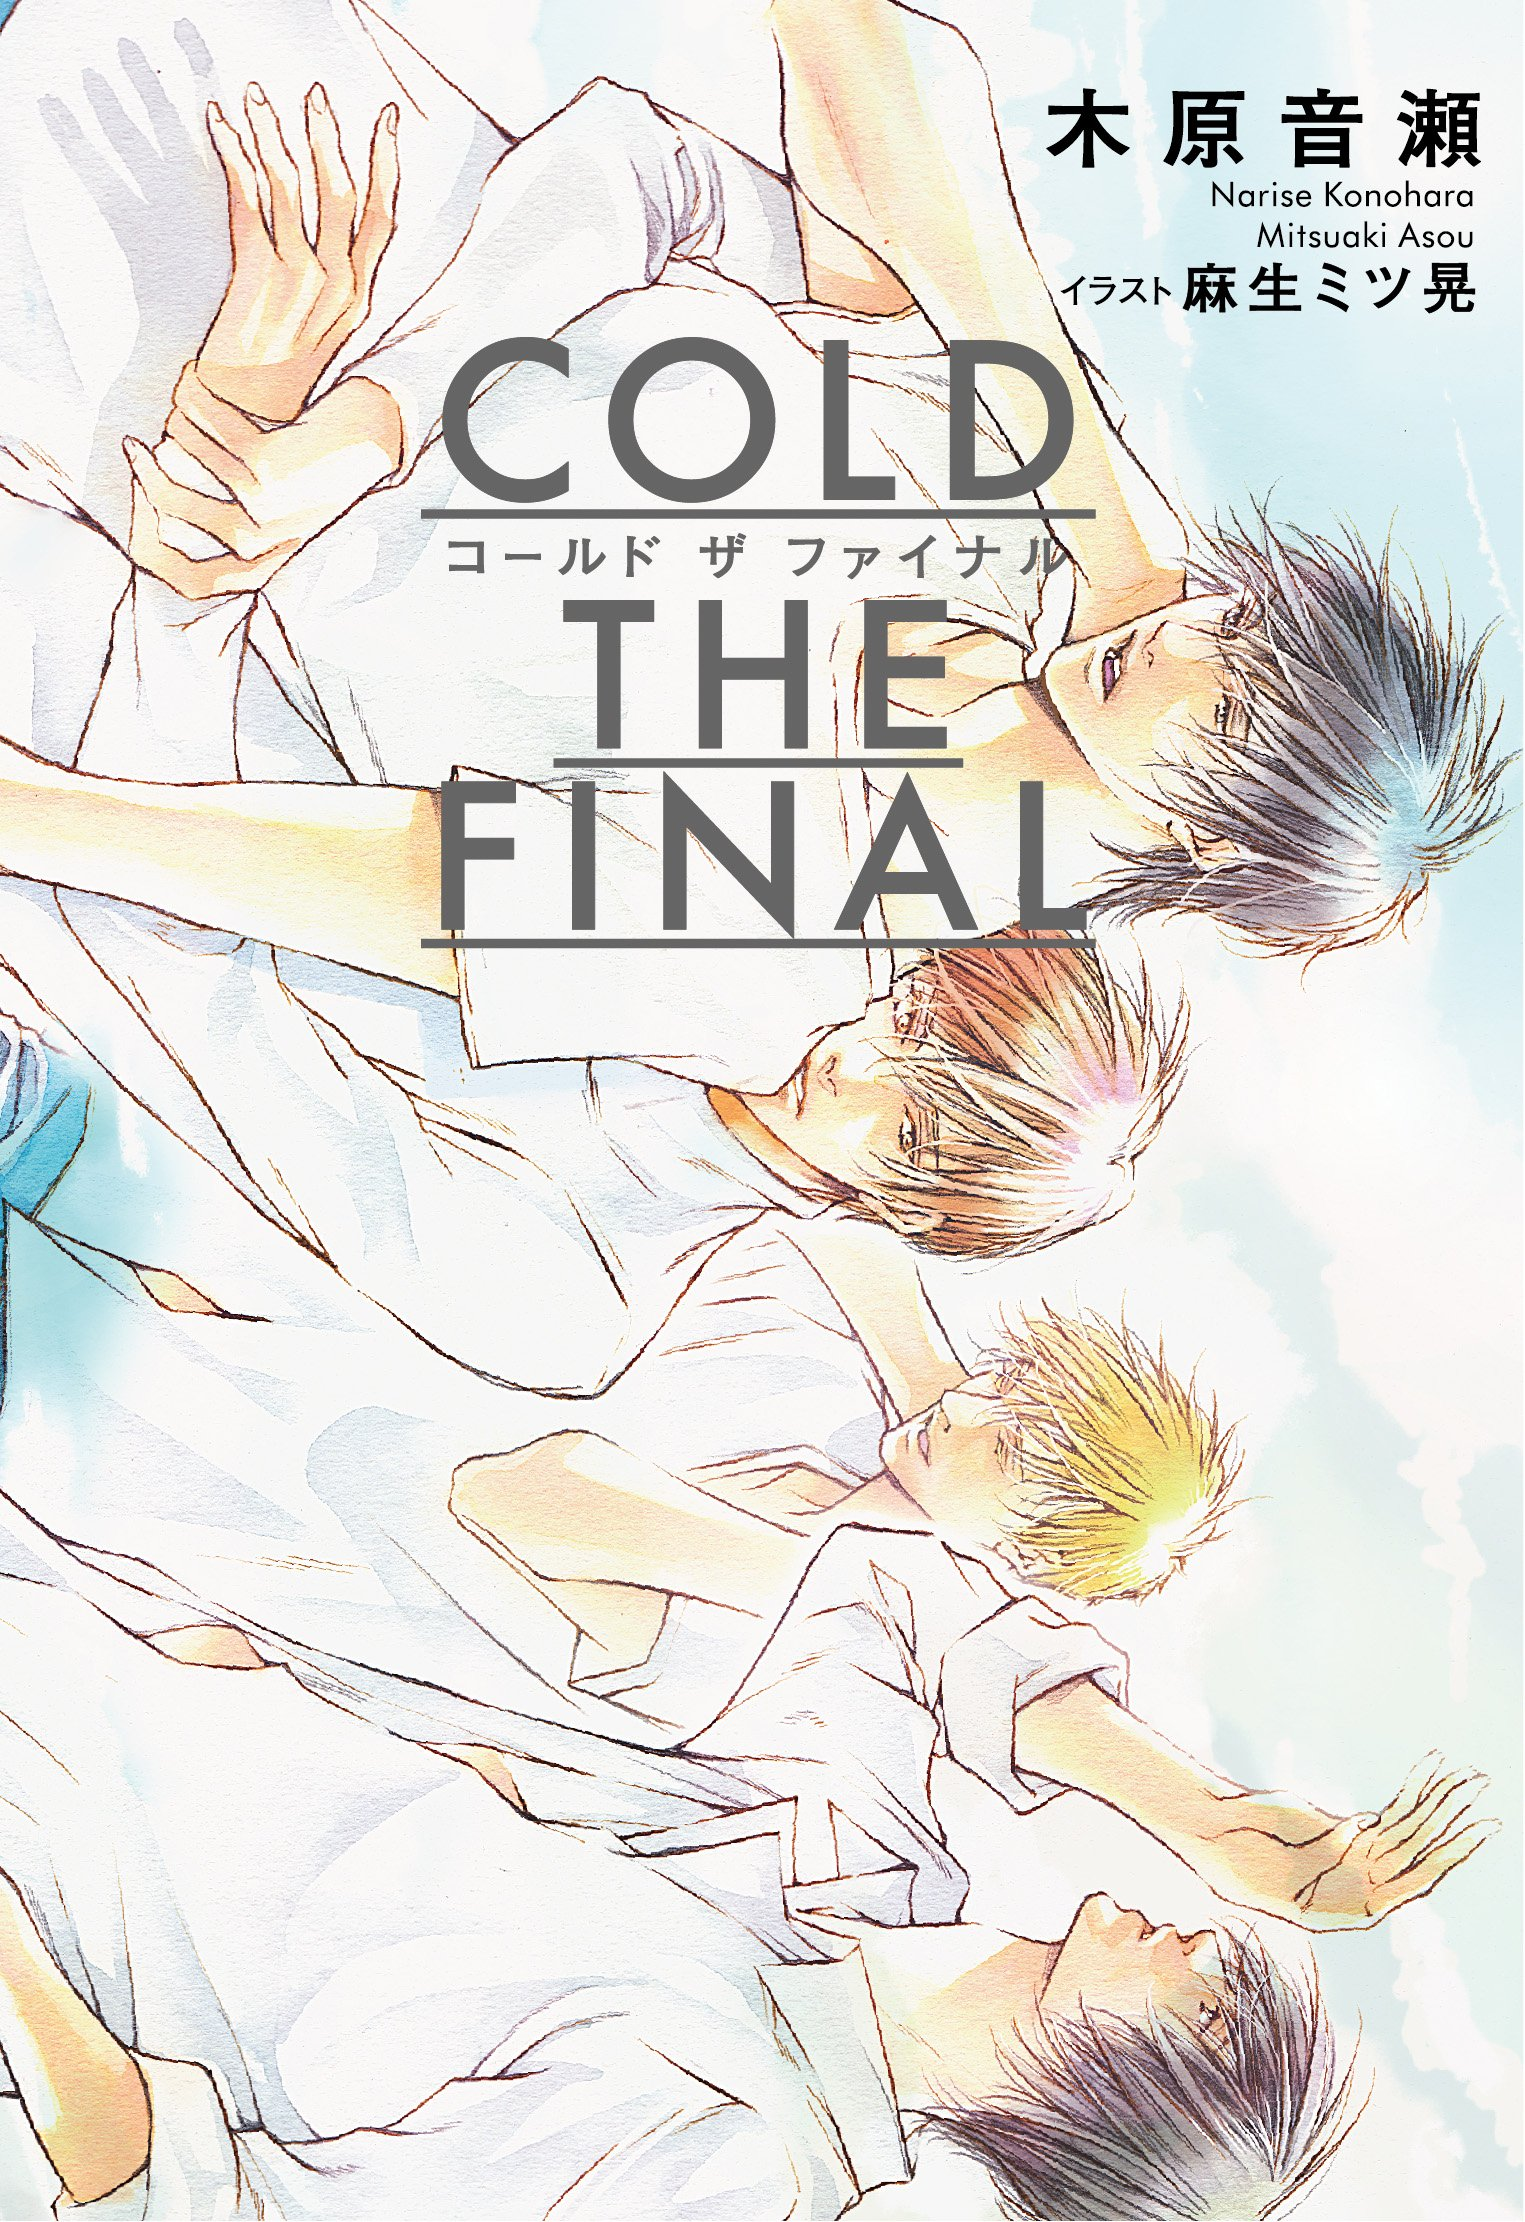 cold the final 木原 音瀬 麻生 ミツ晃 本 通販 amazon